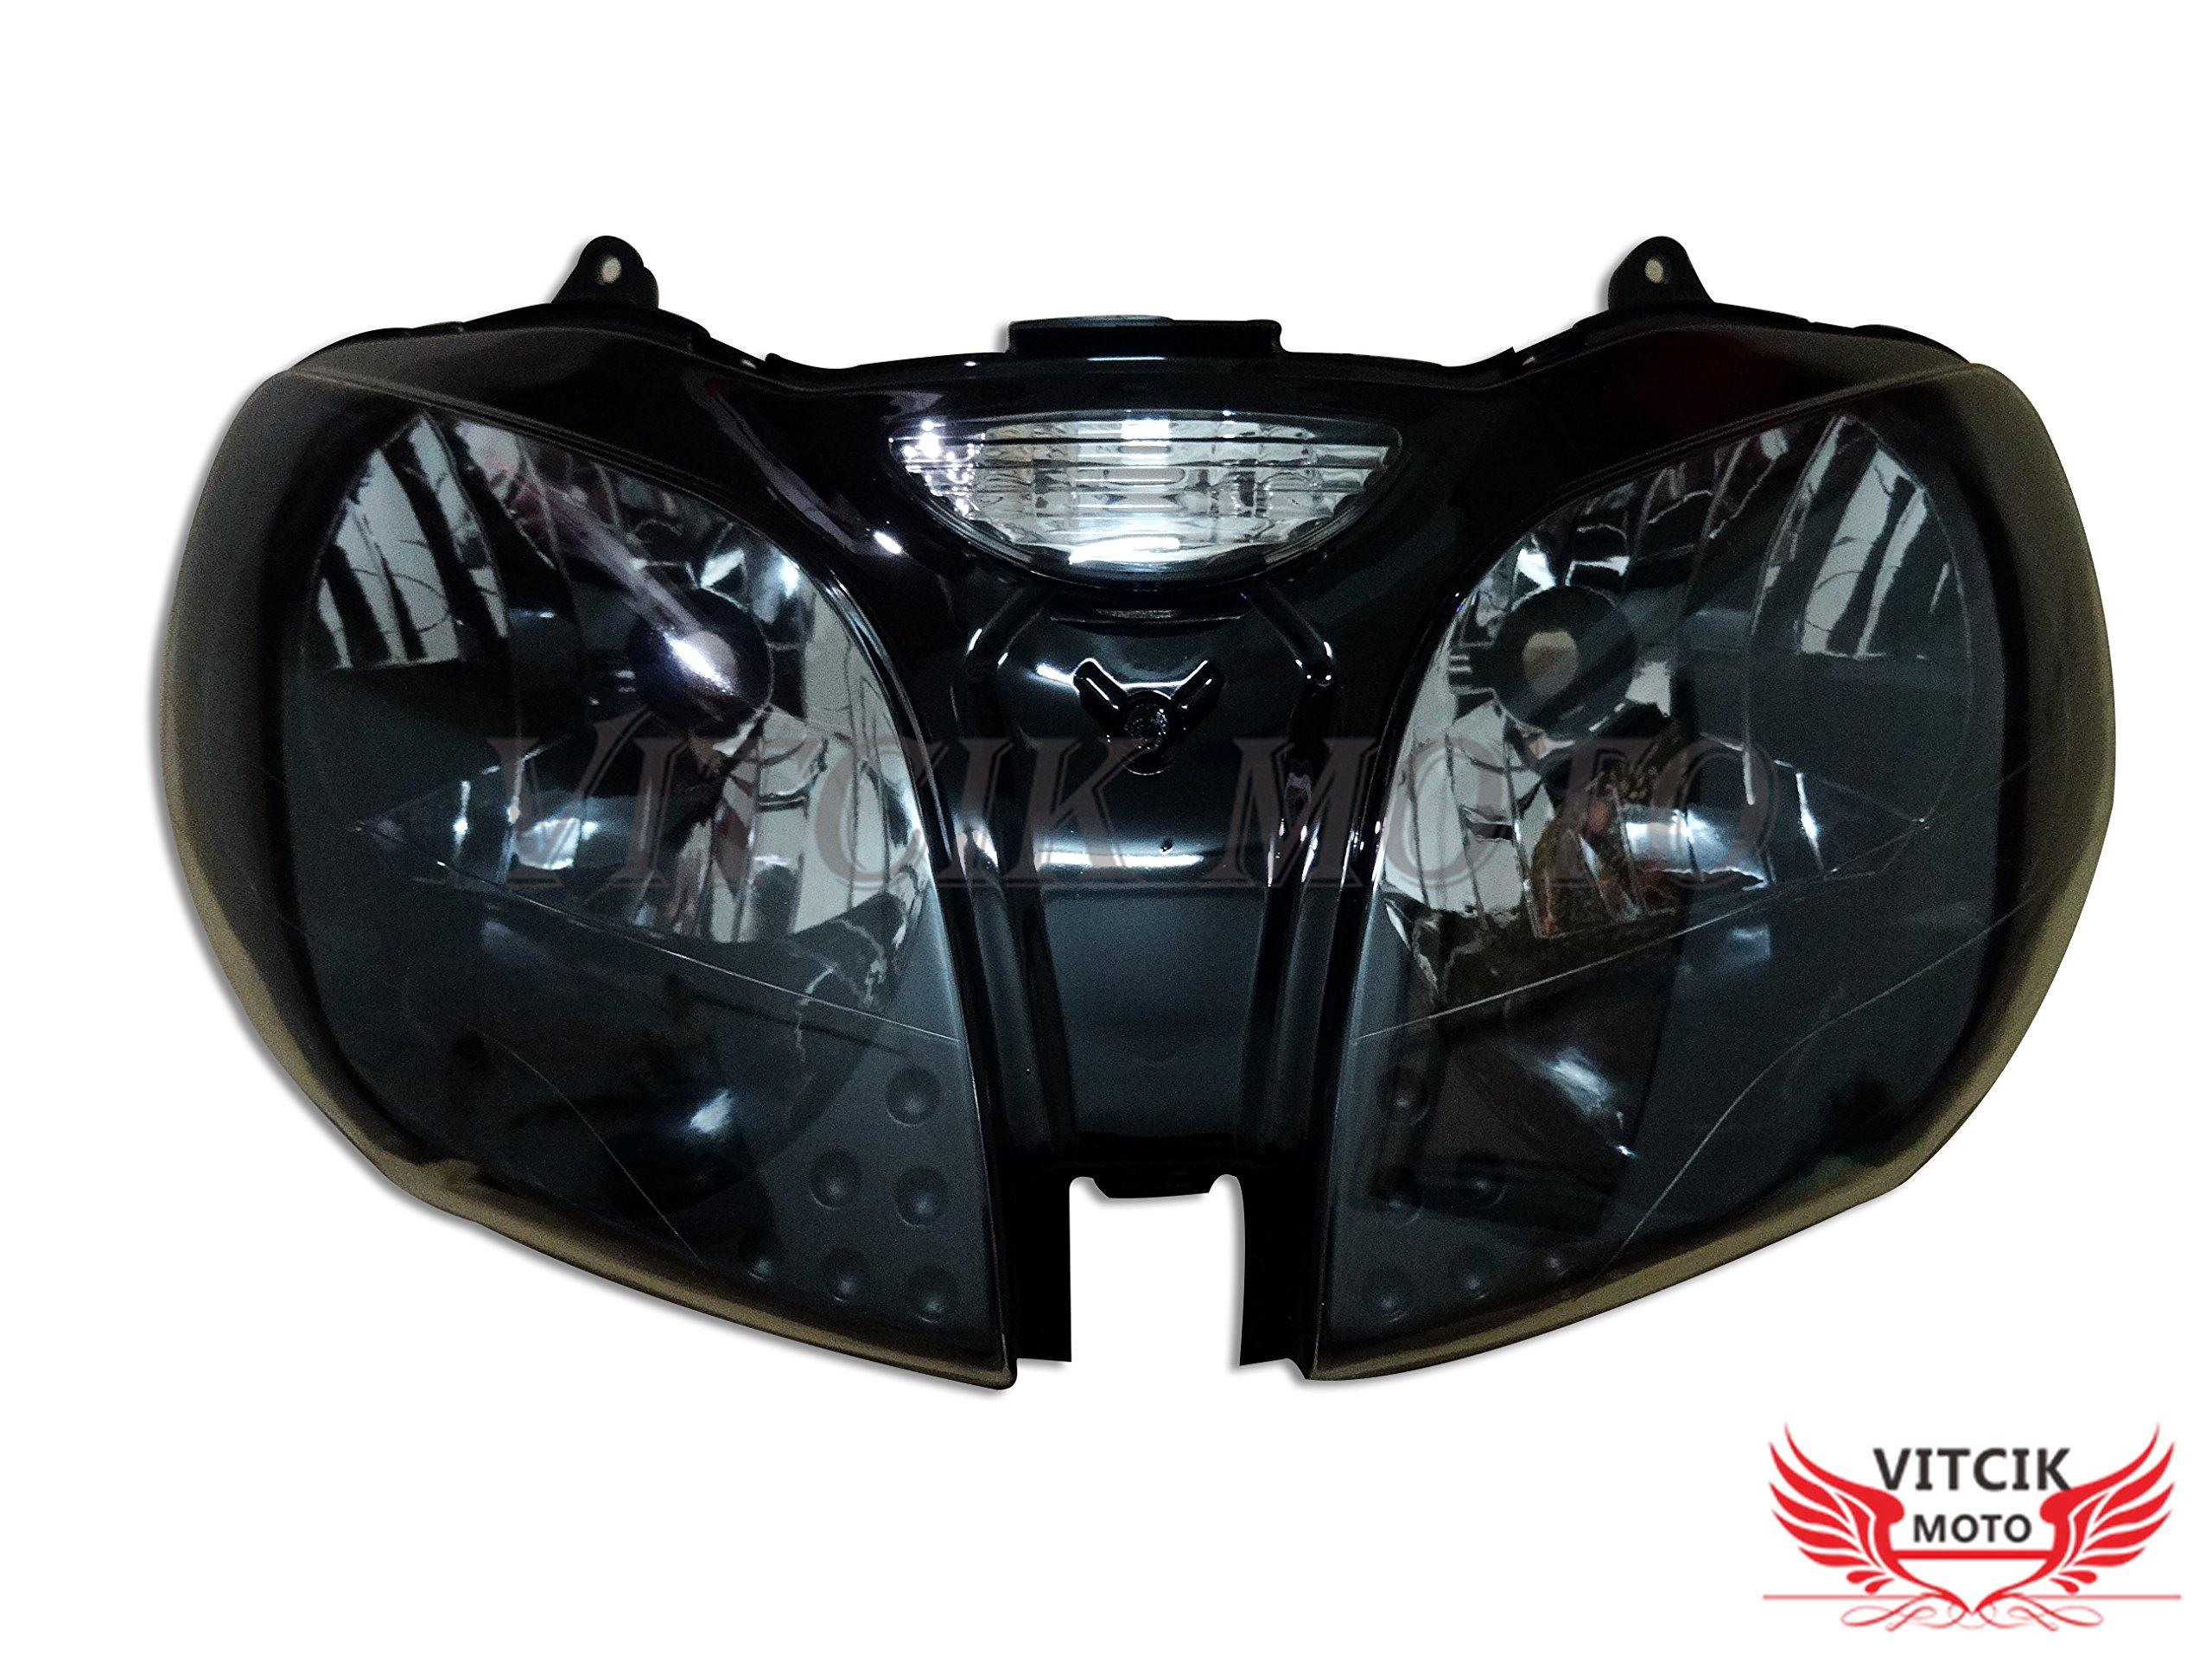 VITCIK Motorcycle Headlight Assembly for Kawasaki ZZR600 ZX600J 2000 2001 2002 2003 2004 2005 2006 2007 2008 Head Light Lamp Assembly Kit (Black)